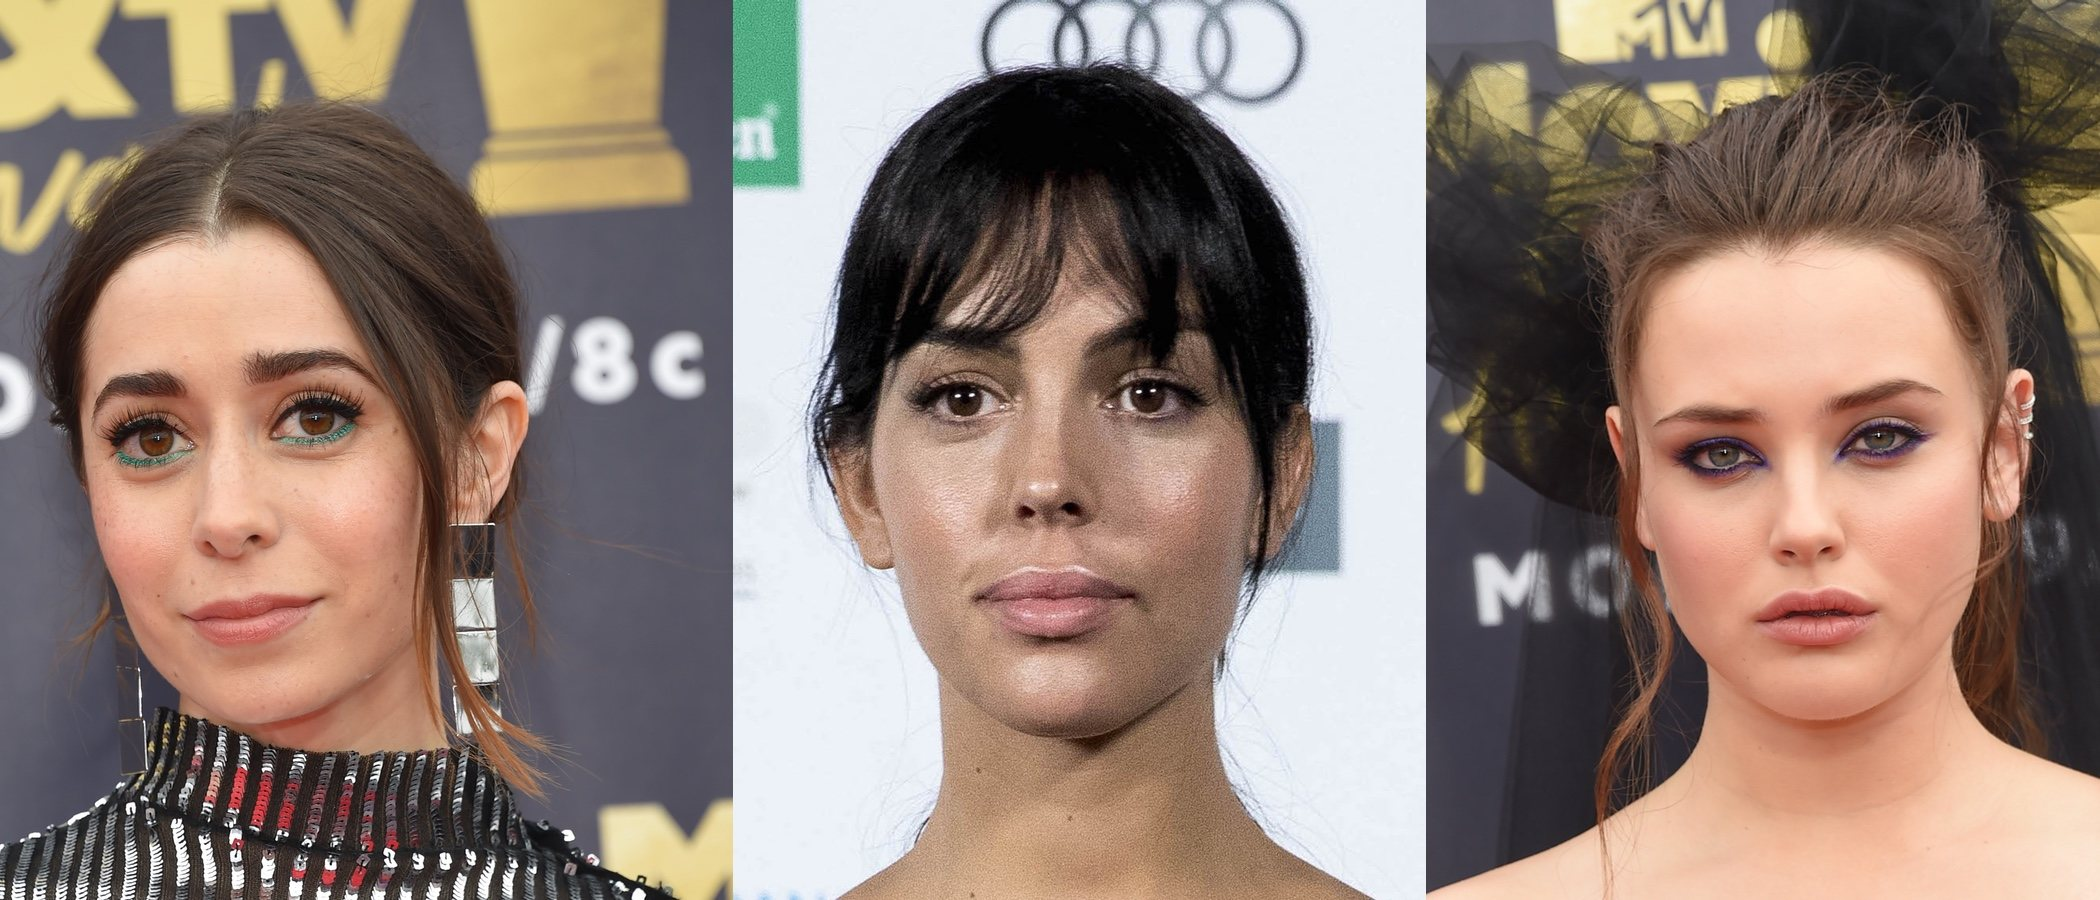 Georgina Rodríguez, Cristin Milioti y Katherine Langford entre los peores beauty looks de la semana